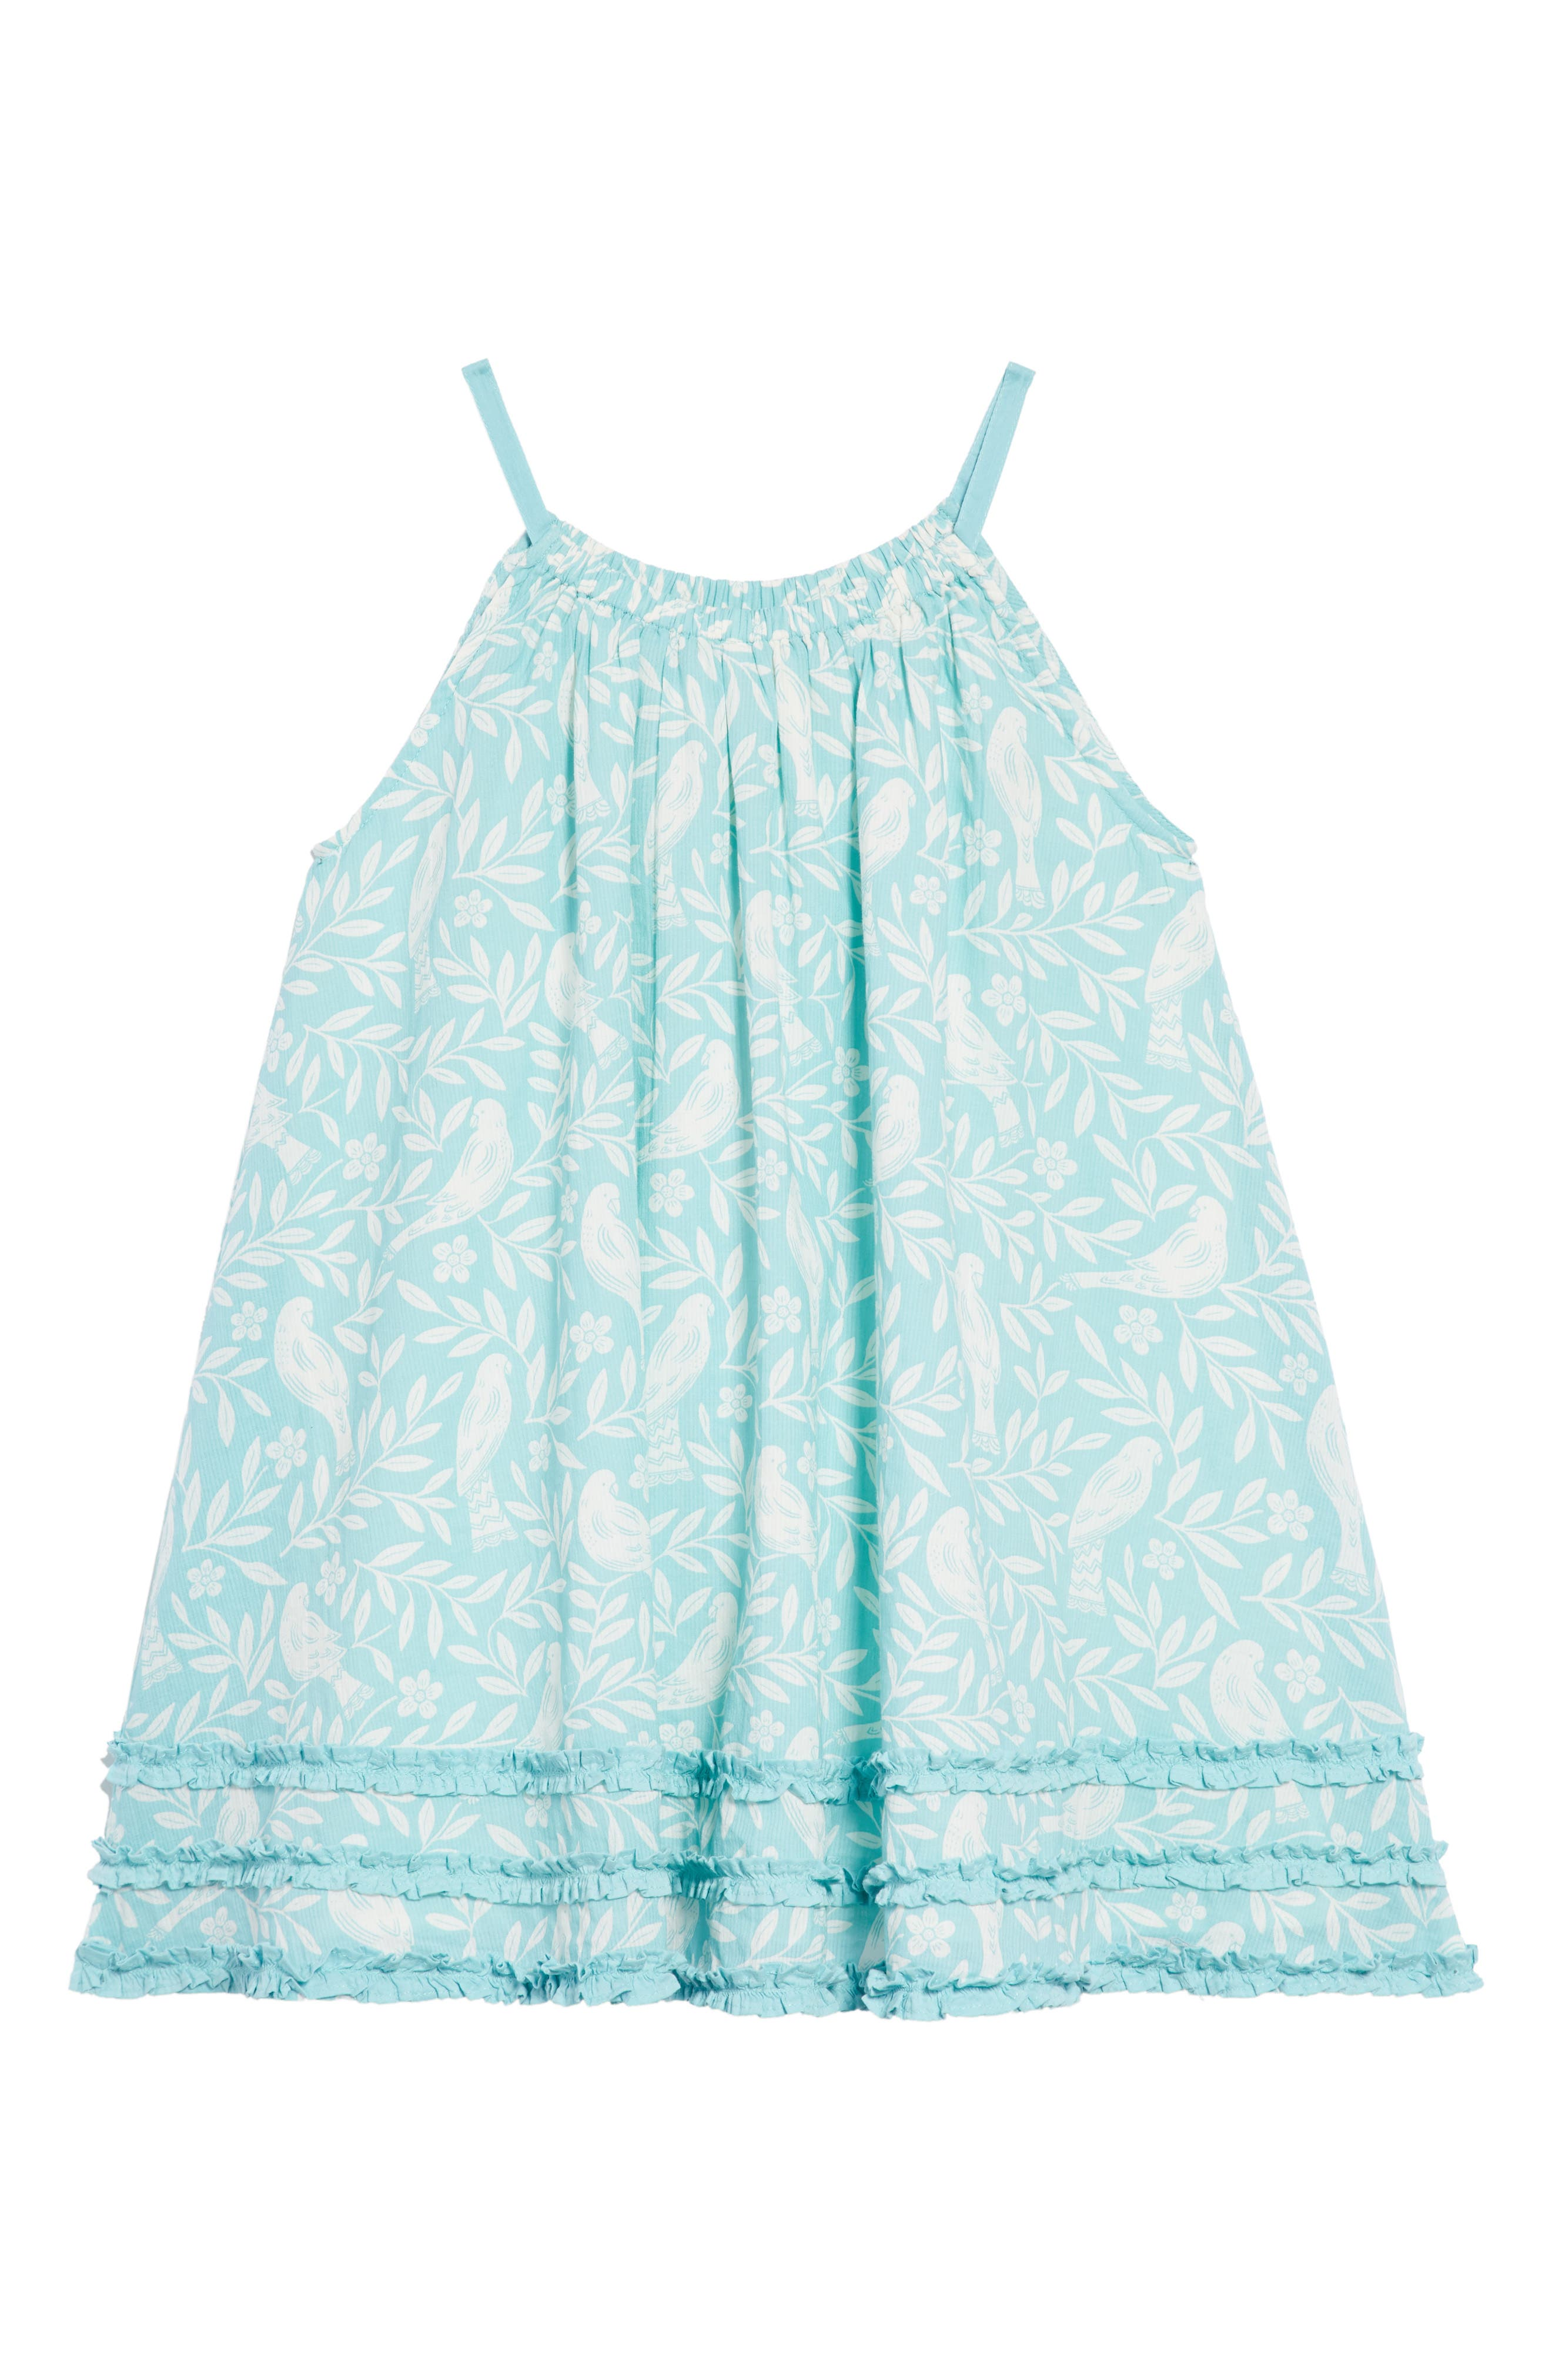 Vacation Woven Dress,                             Alternate thumbnail 2, color,                             454